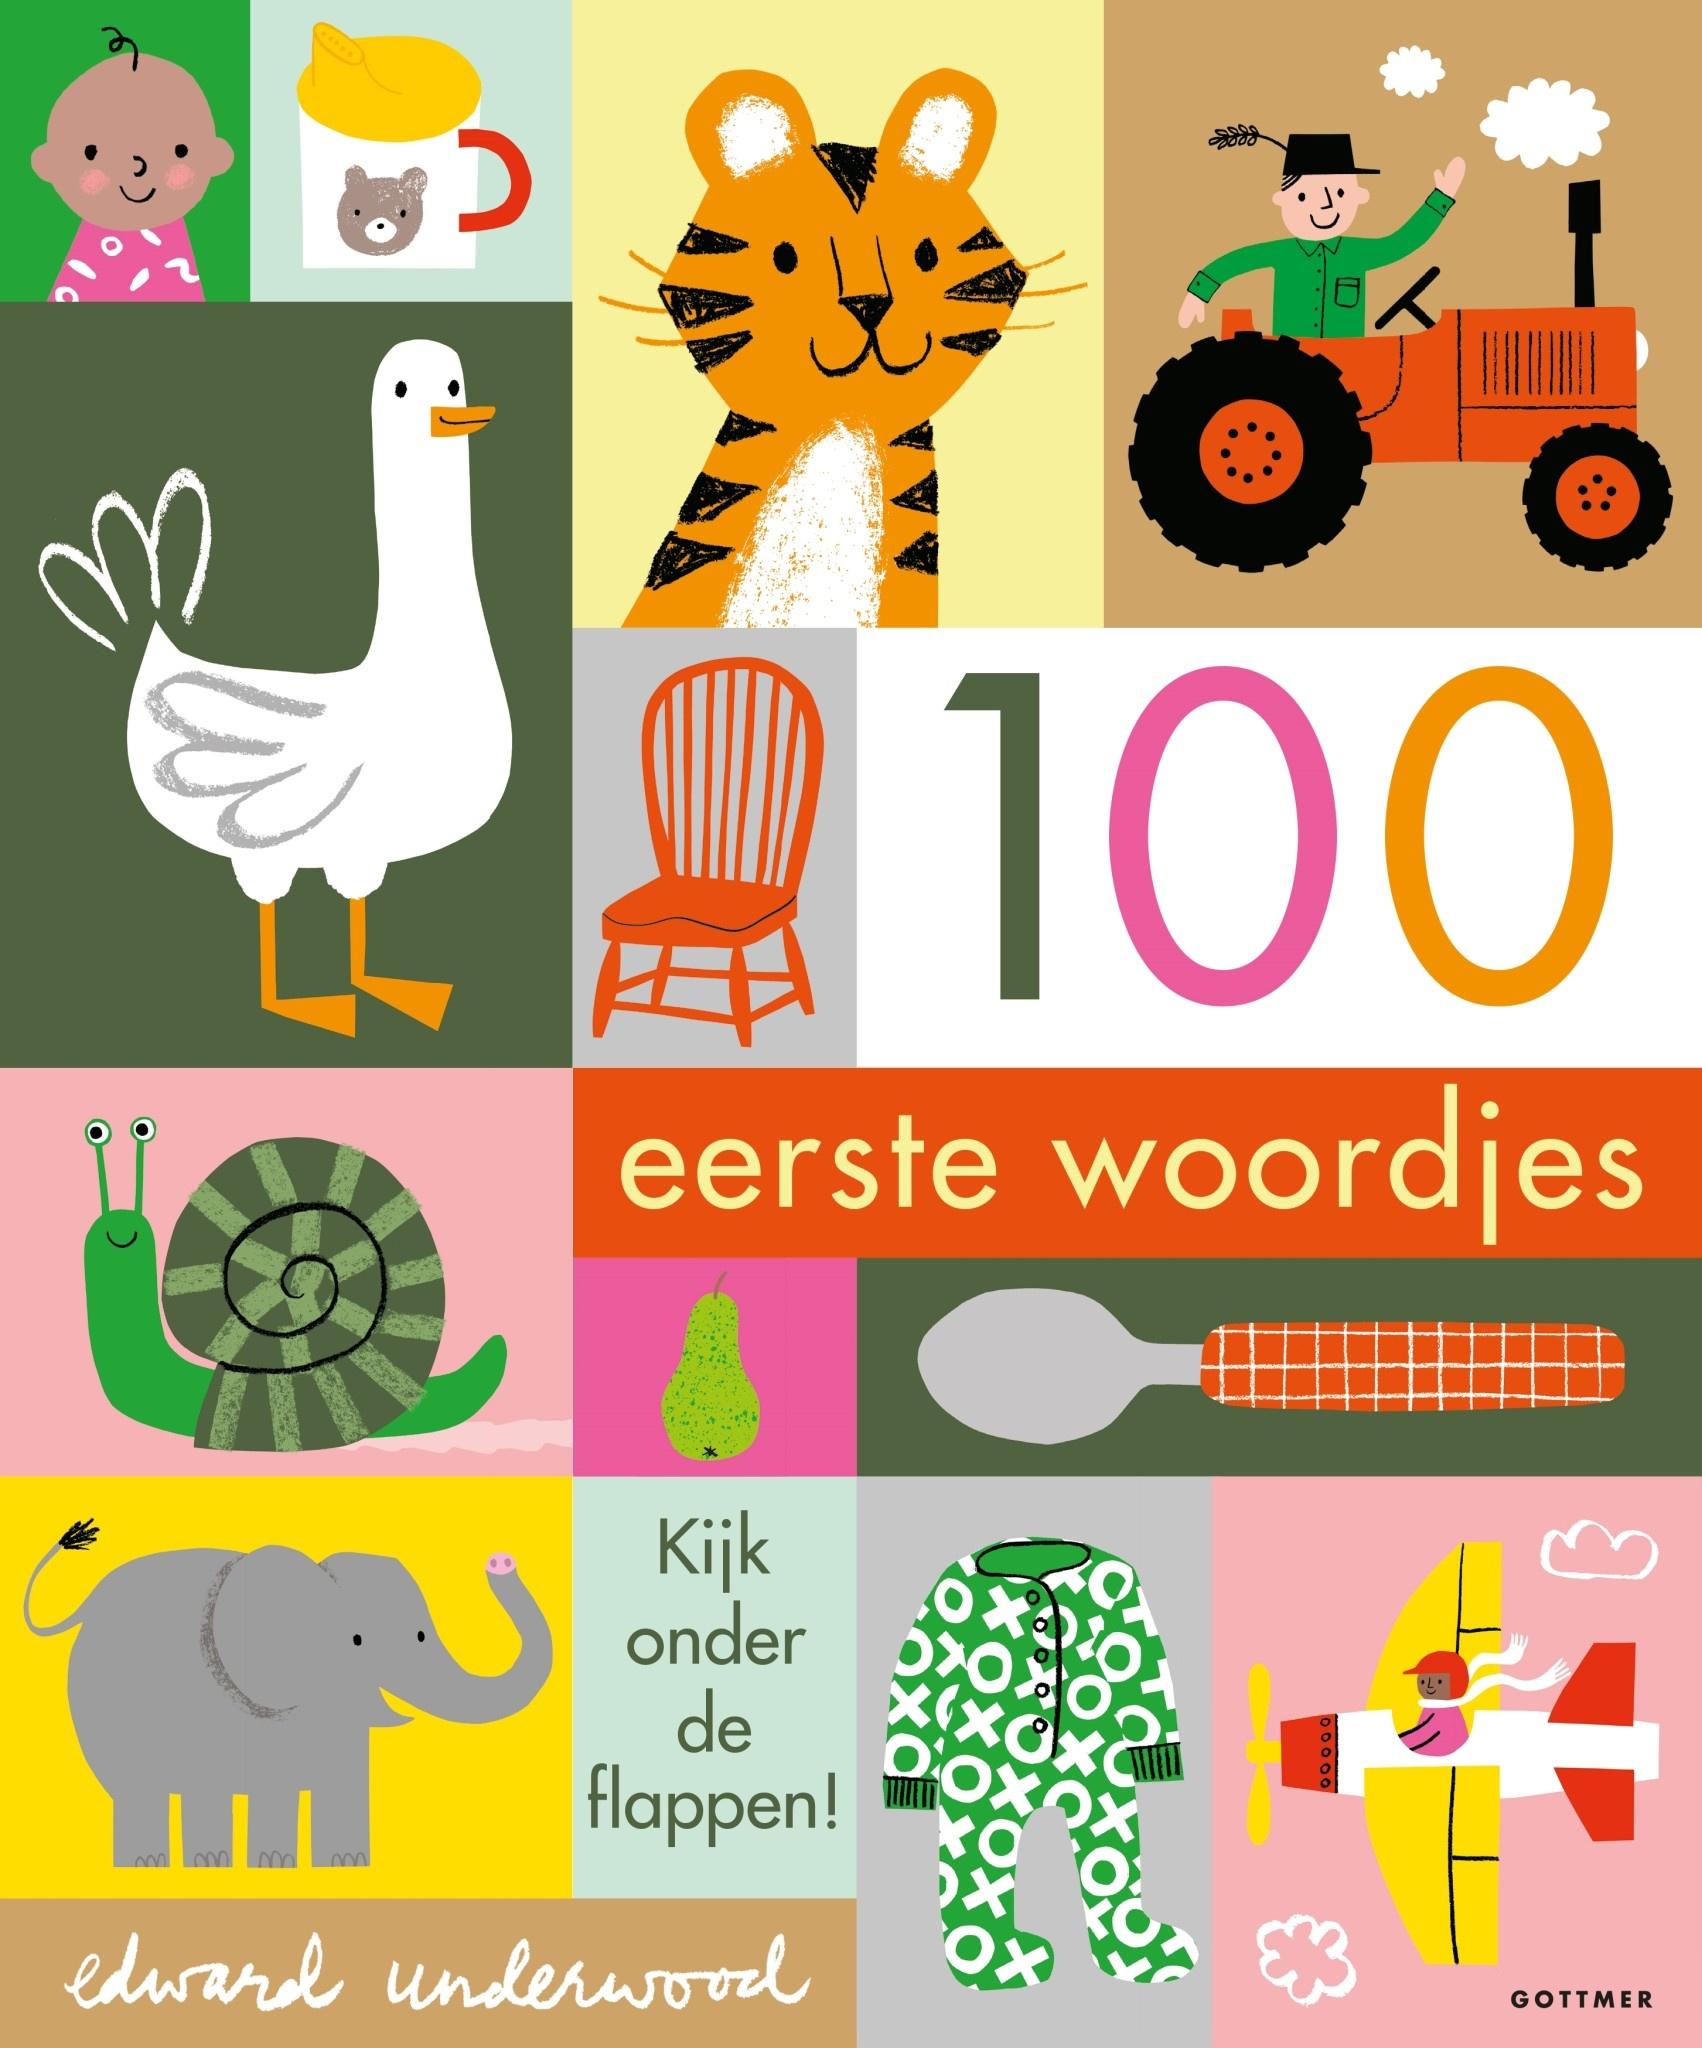 Boek- 100 eerste woordjes-1